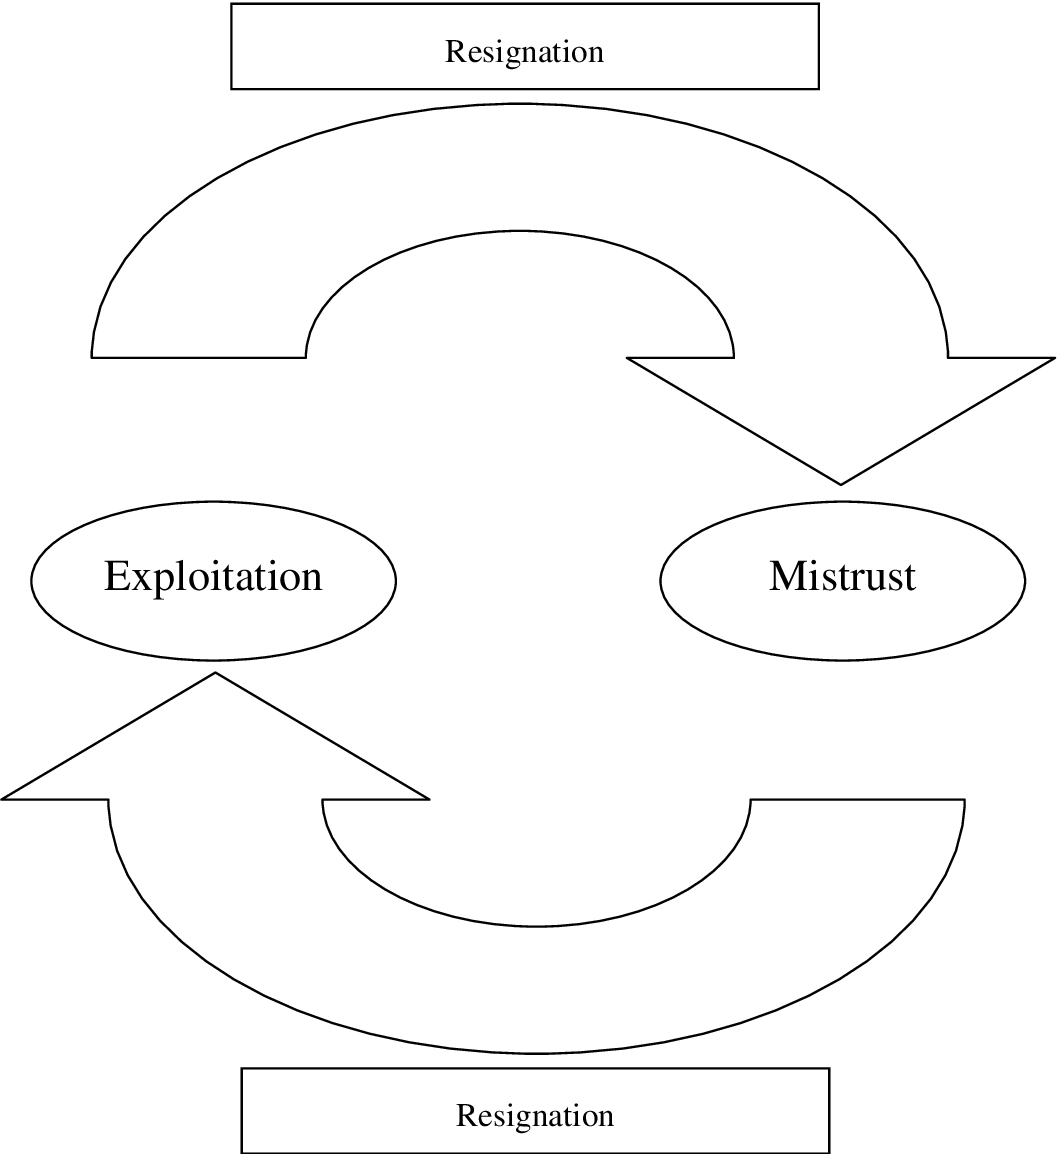 figure 8-8